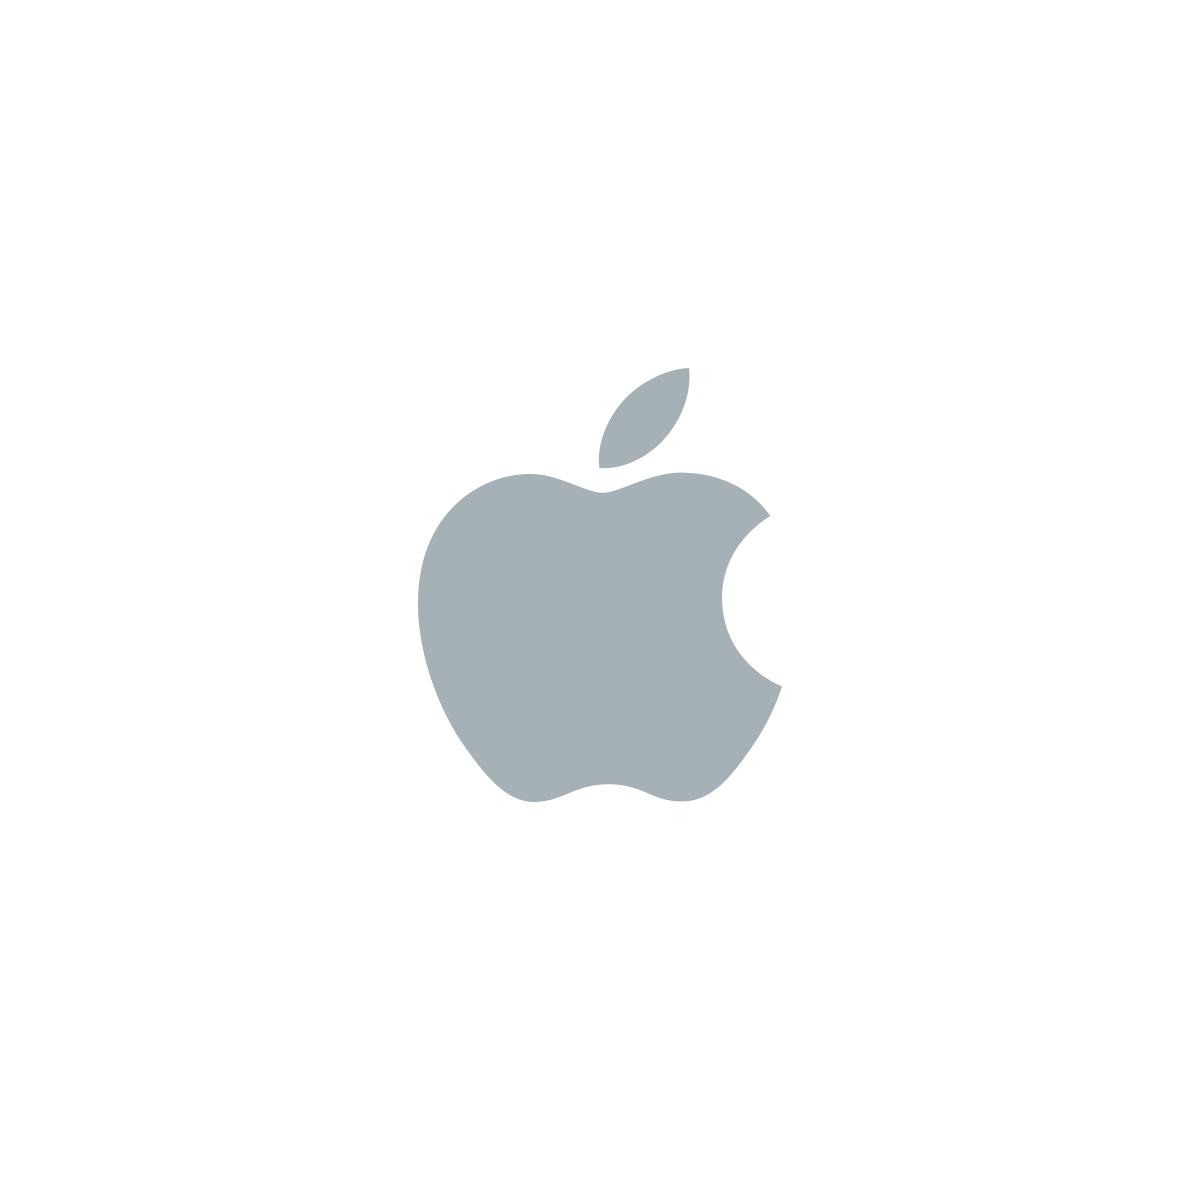 iPad Air 2 Özellikleri